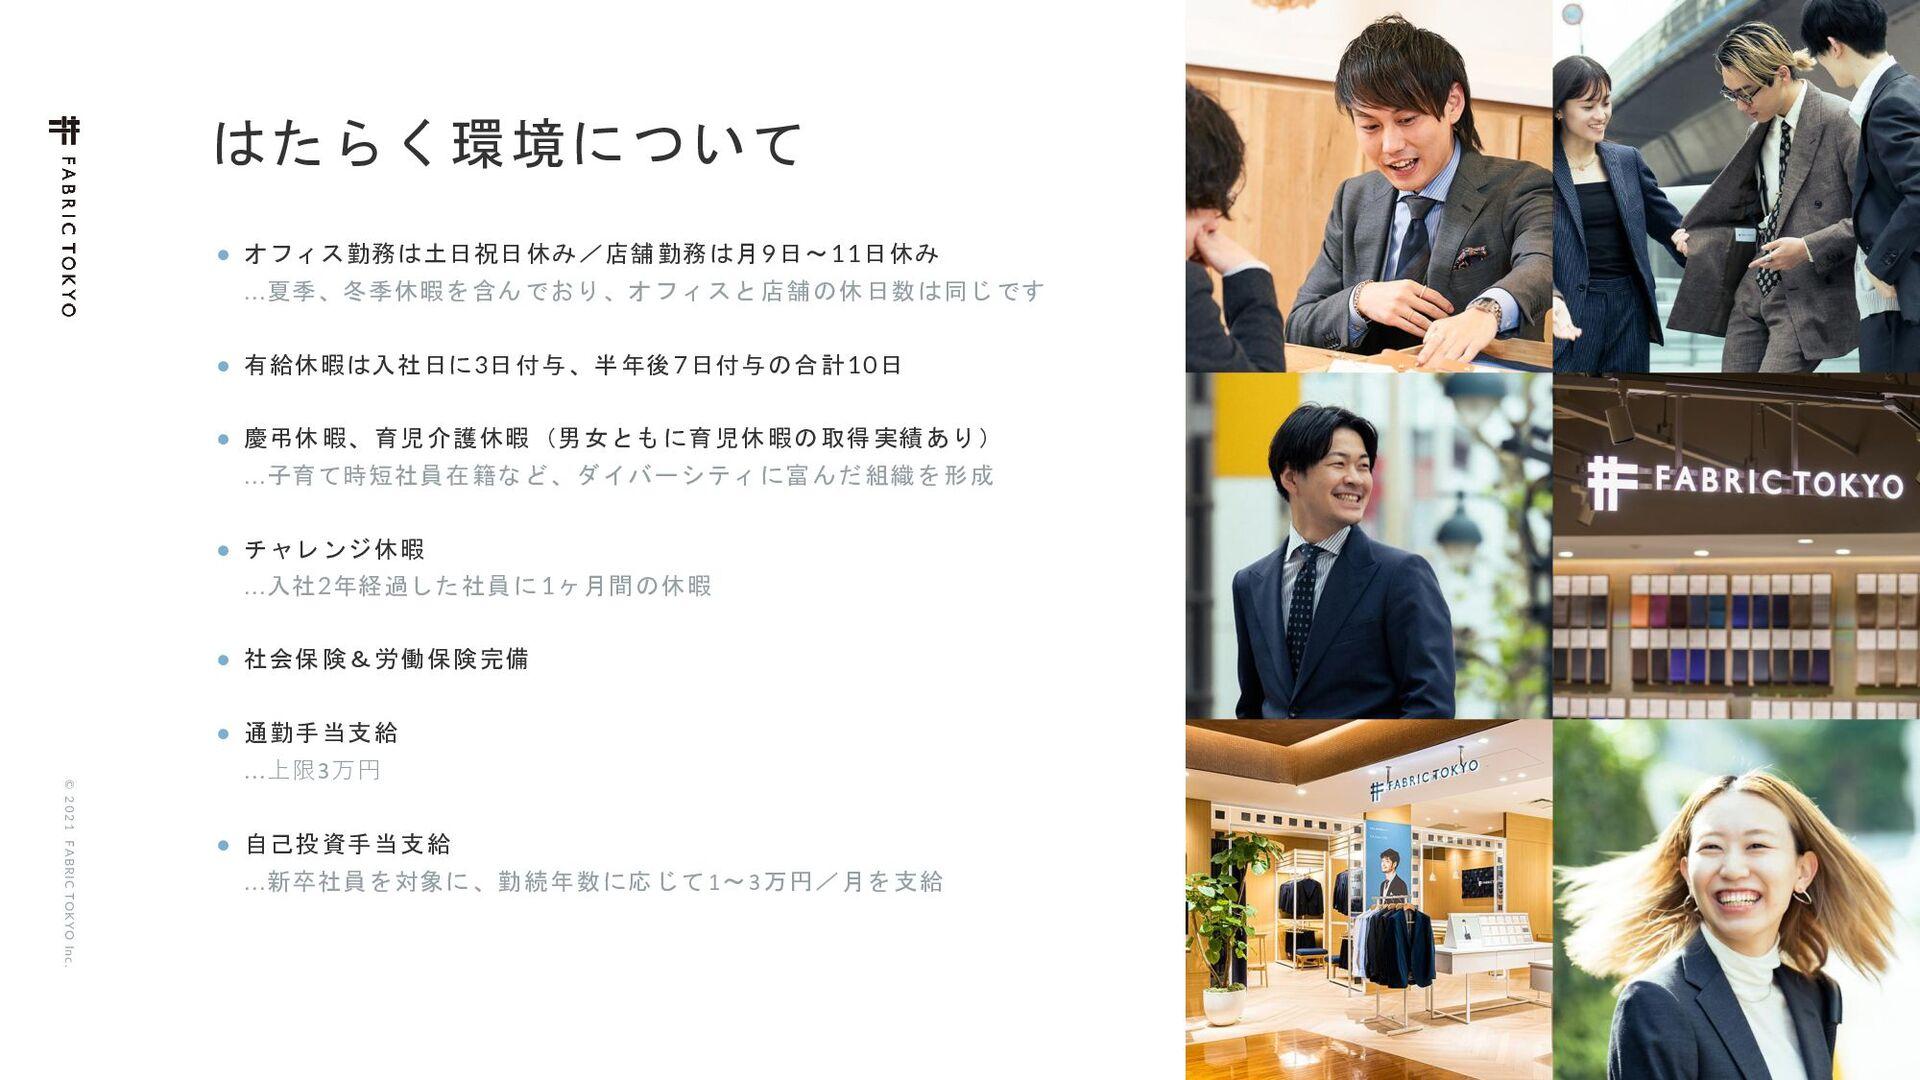 © 2021 FABRIC TOKYO Inc. 36 Χϧνϟʔʹ͍ͭͯʢOPENʣ FAB...